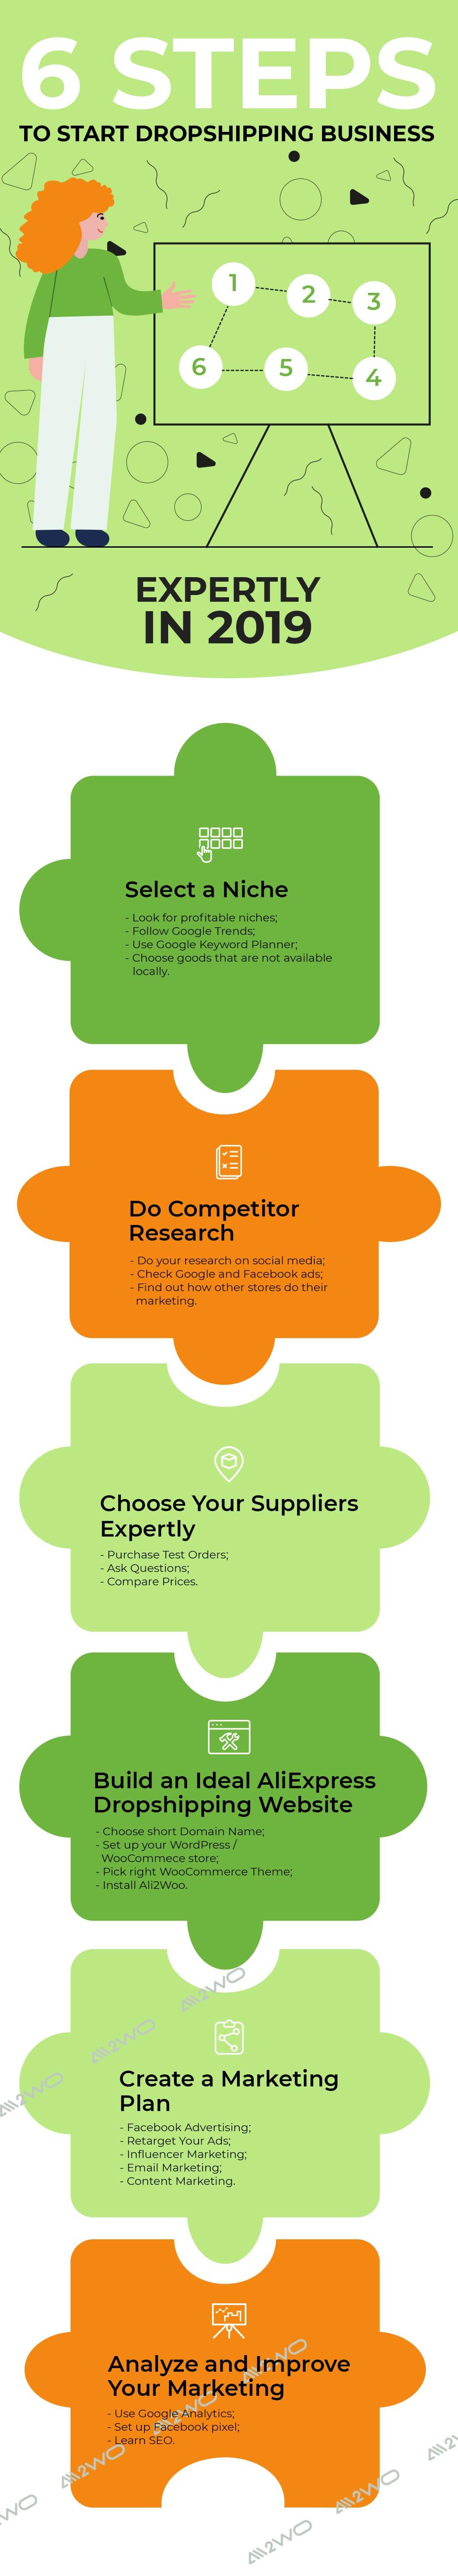 6-steps-start-dropshipping